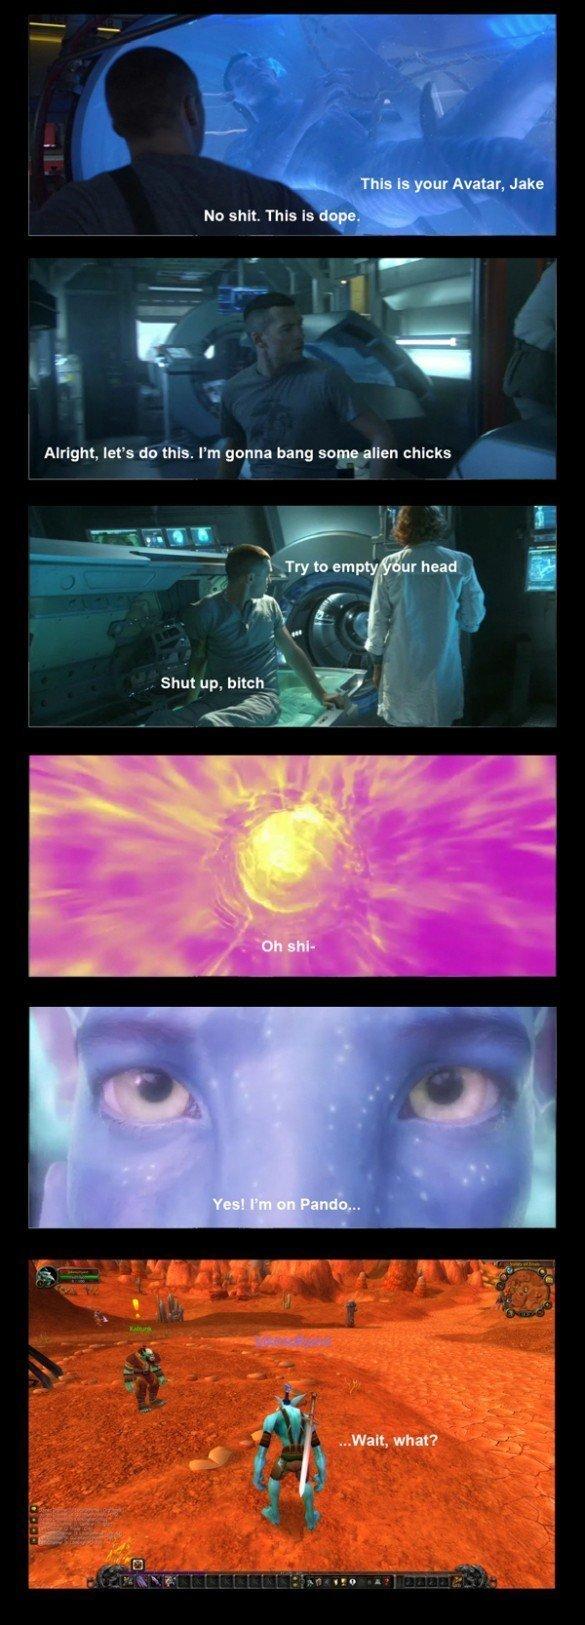 Avatar. .. she trolled him hard